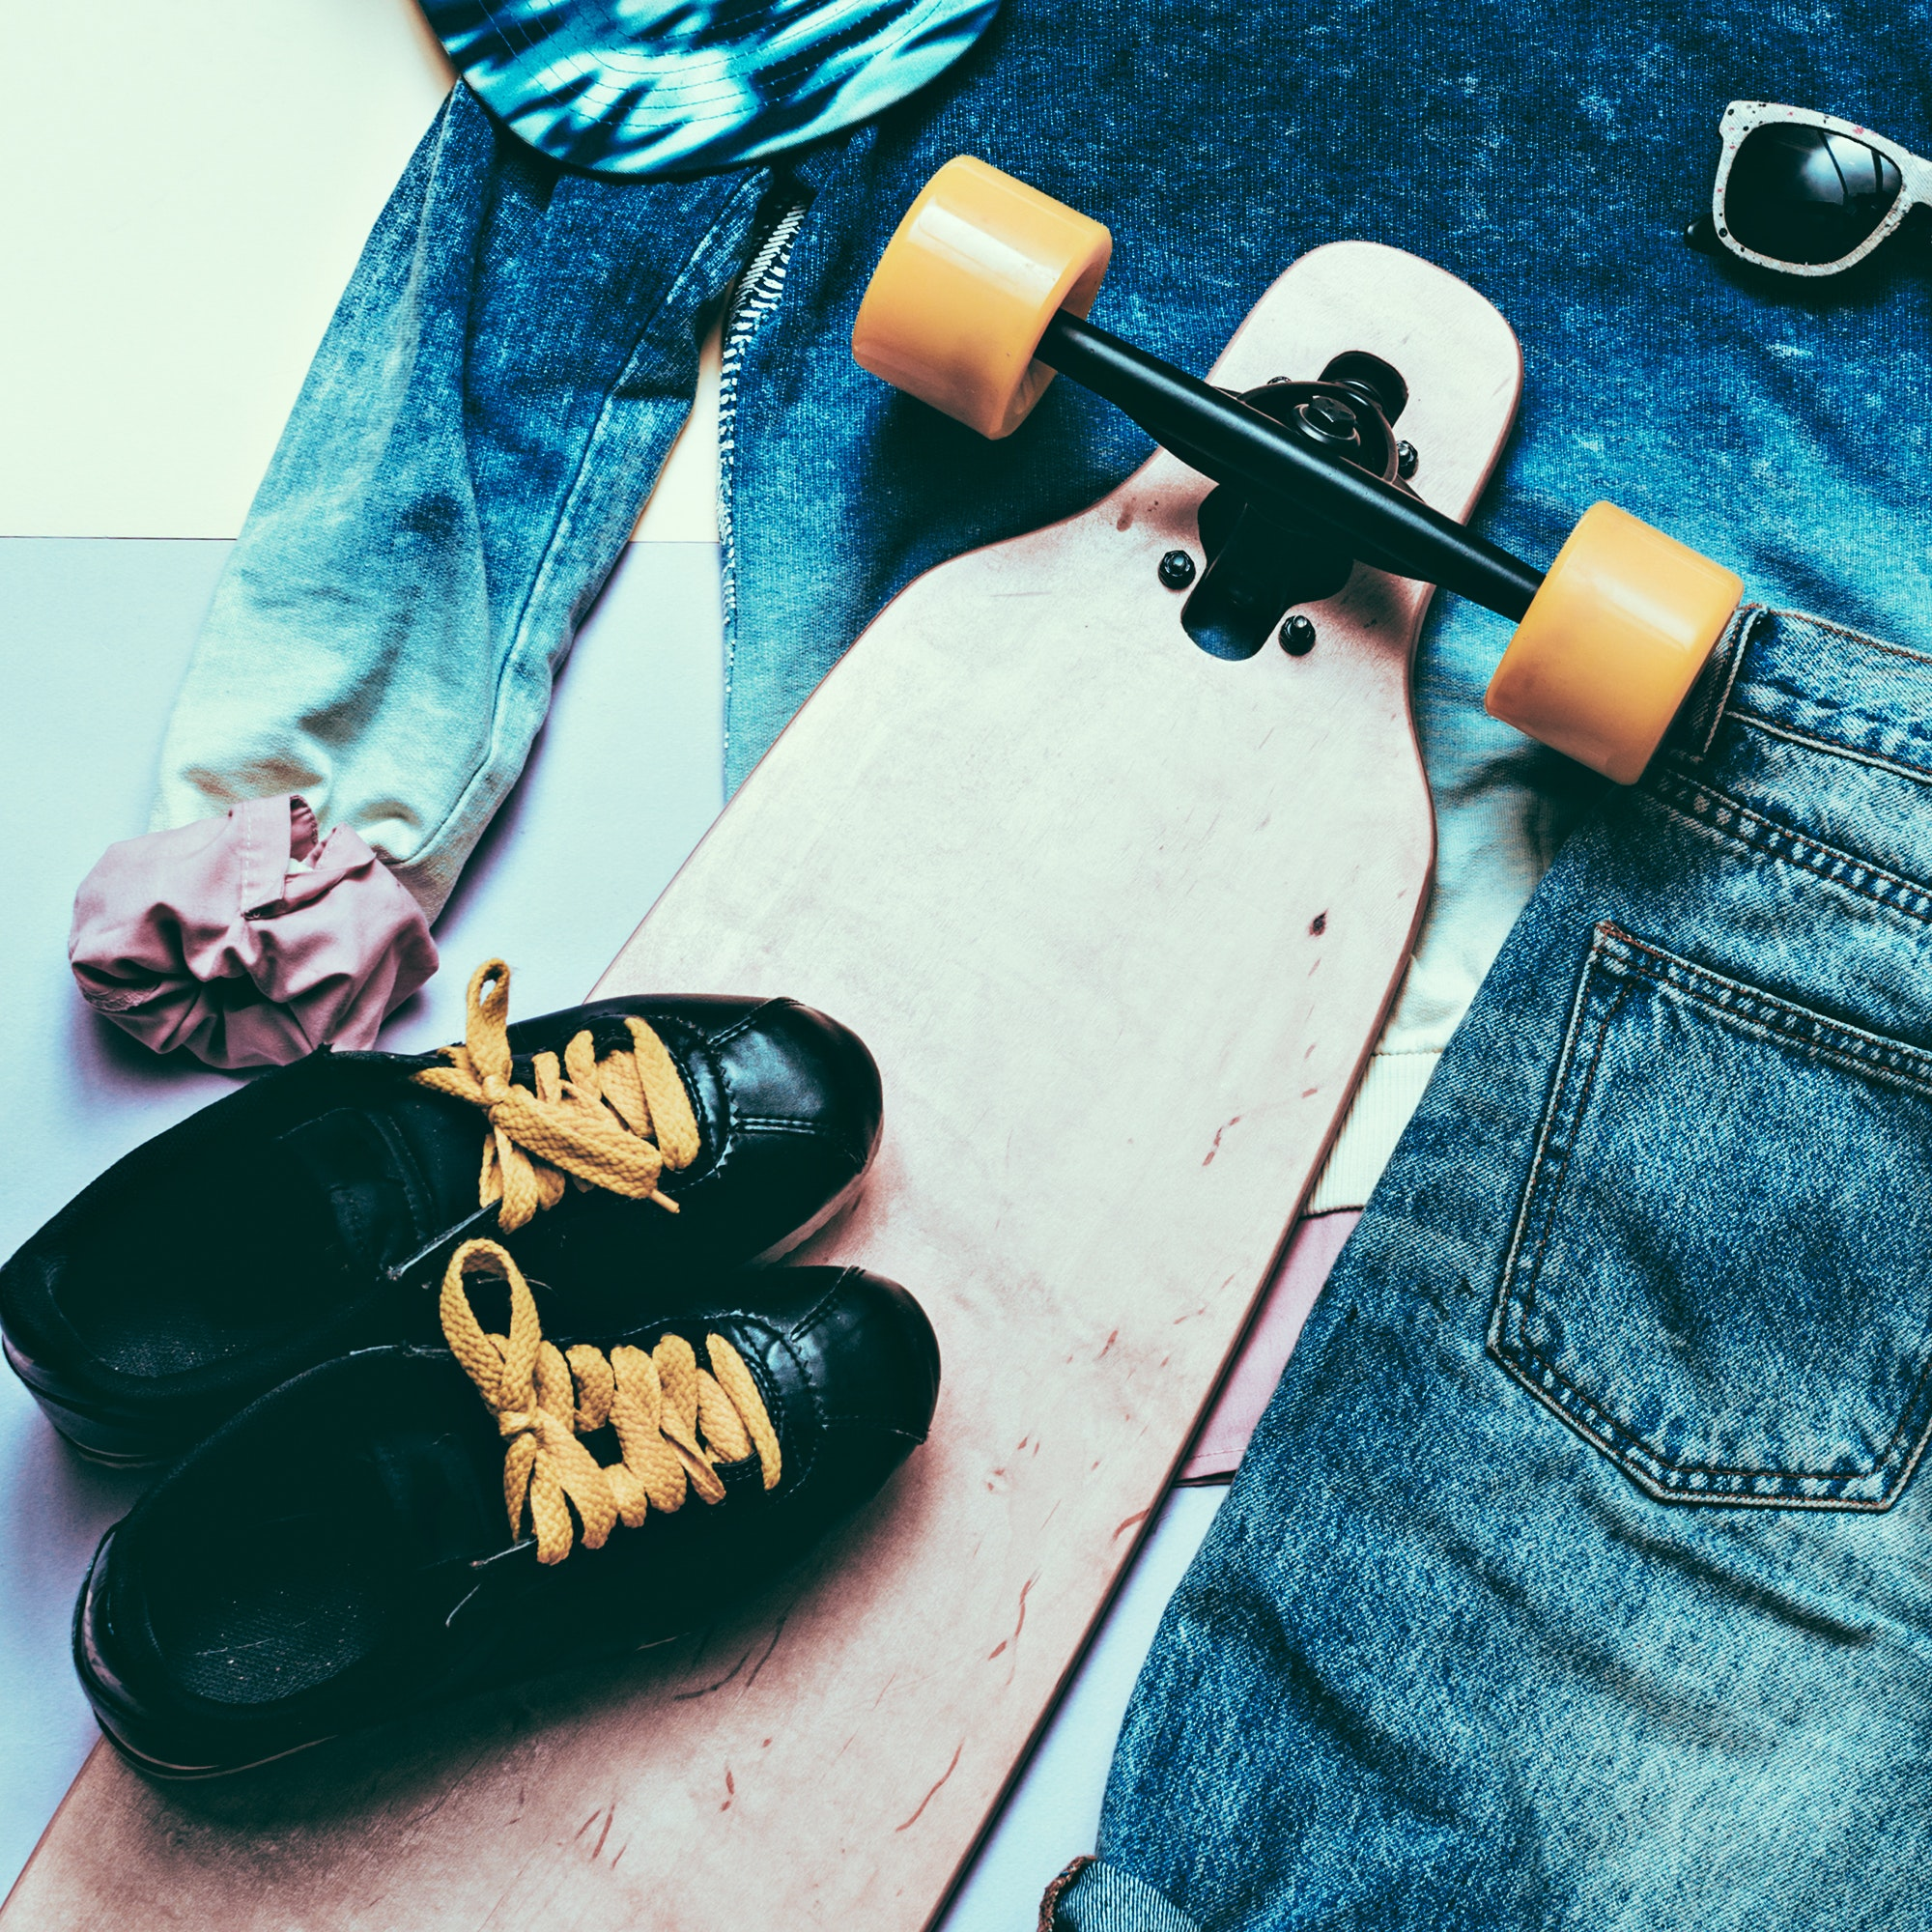 Set Fashion Denim clothing and accessories Cap Skateboard Sneake